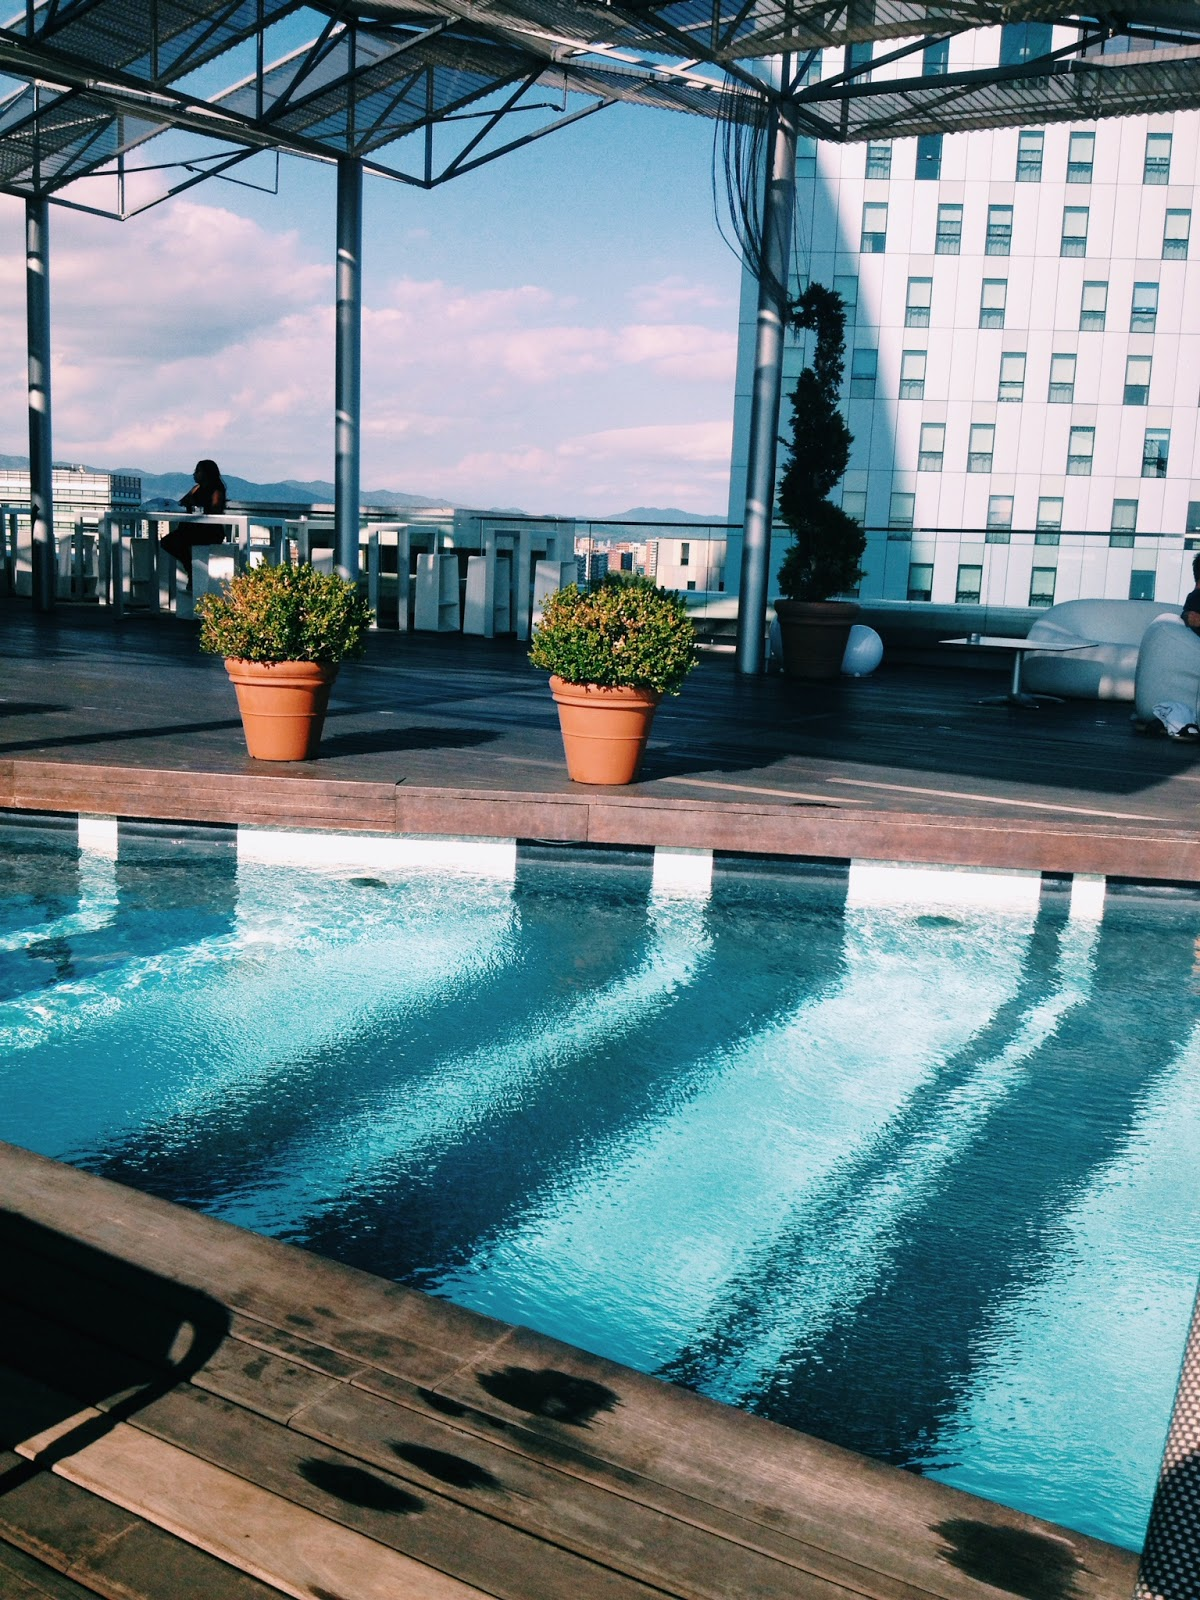 Barcelona rooftop pools